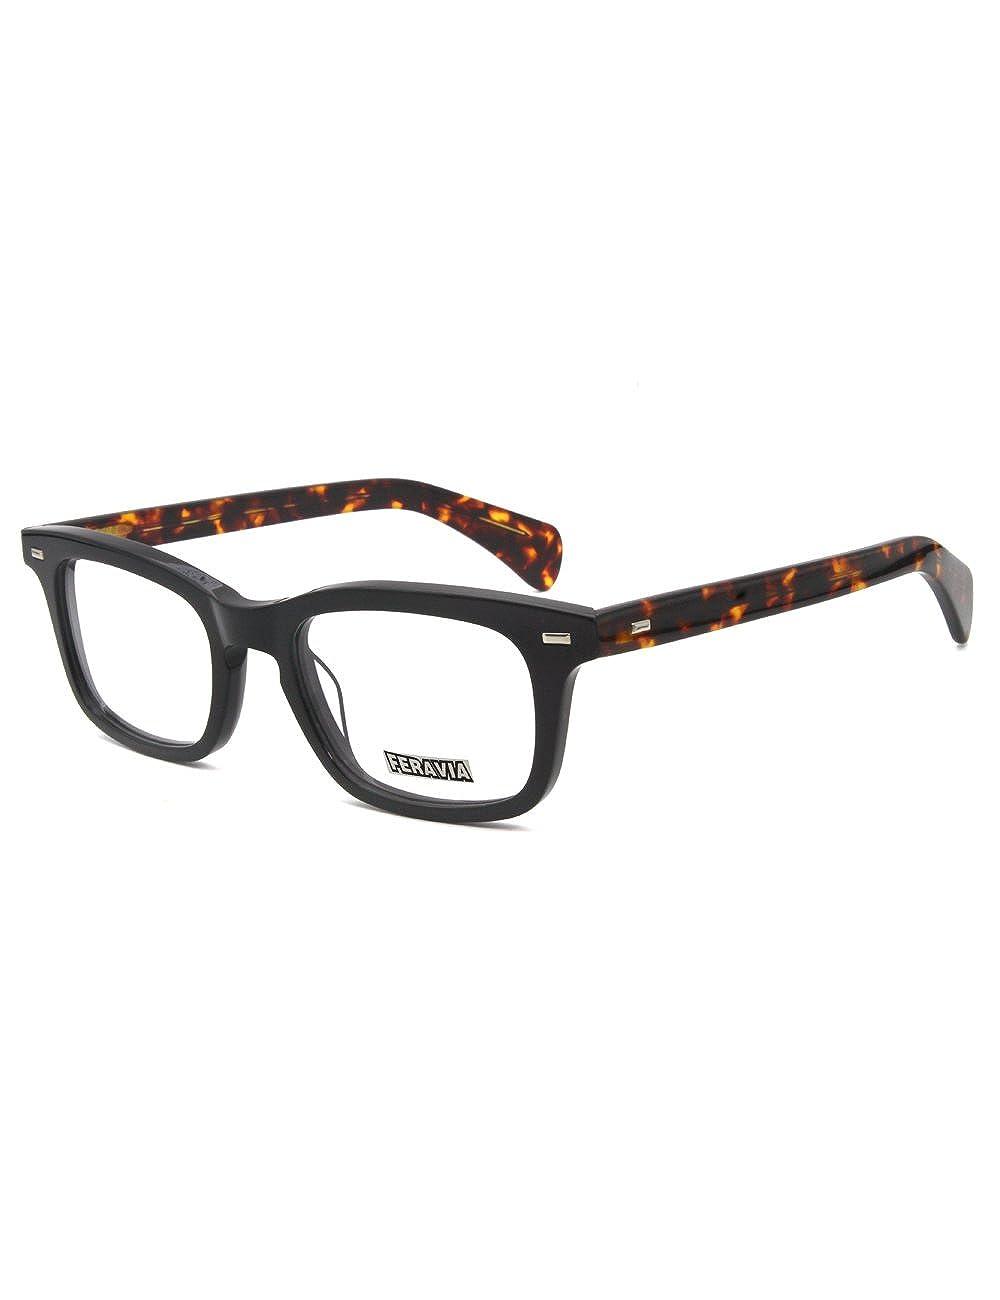 Men Eyeglasses Strong Look Bold Rectangular Clear Lens Two Toned Acetate Lixin Glasses